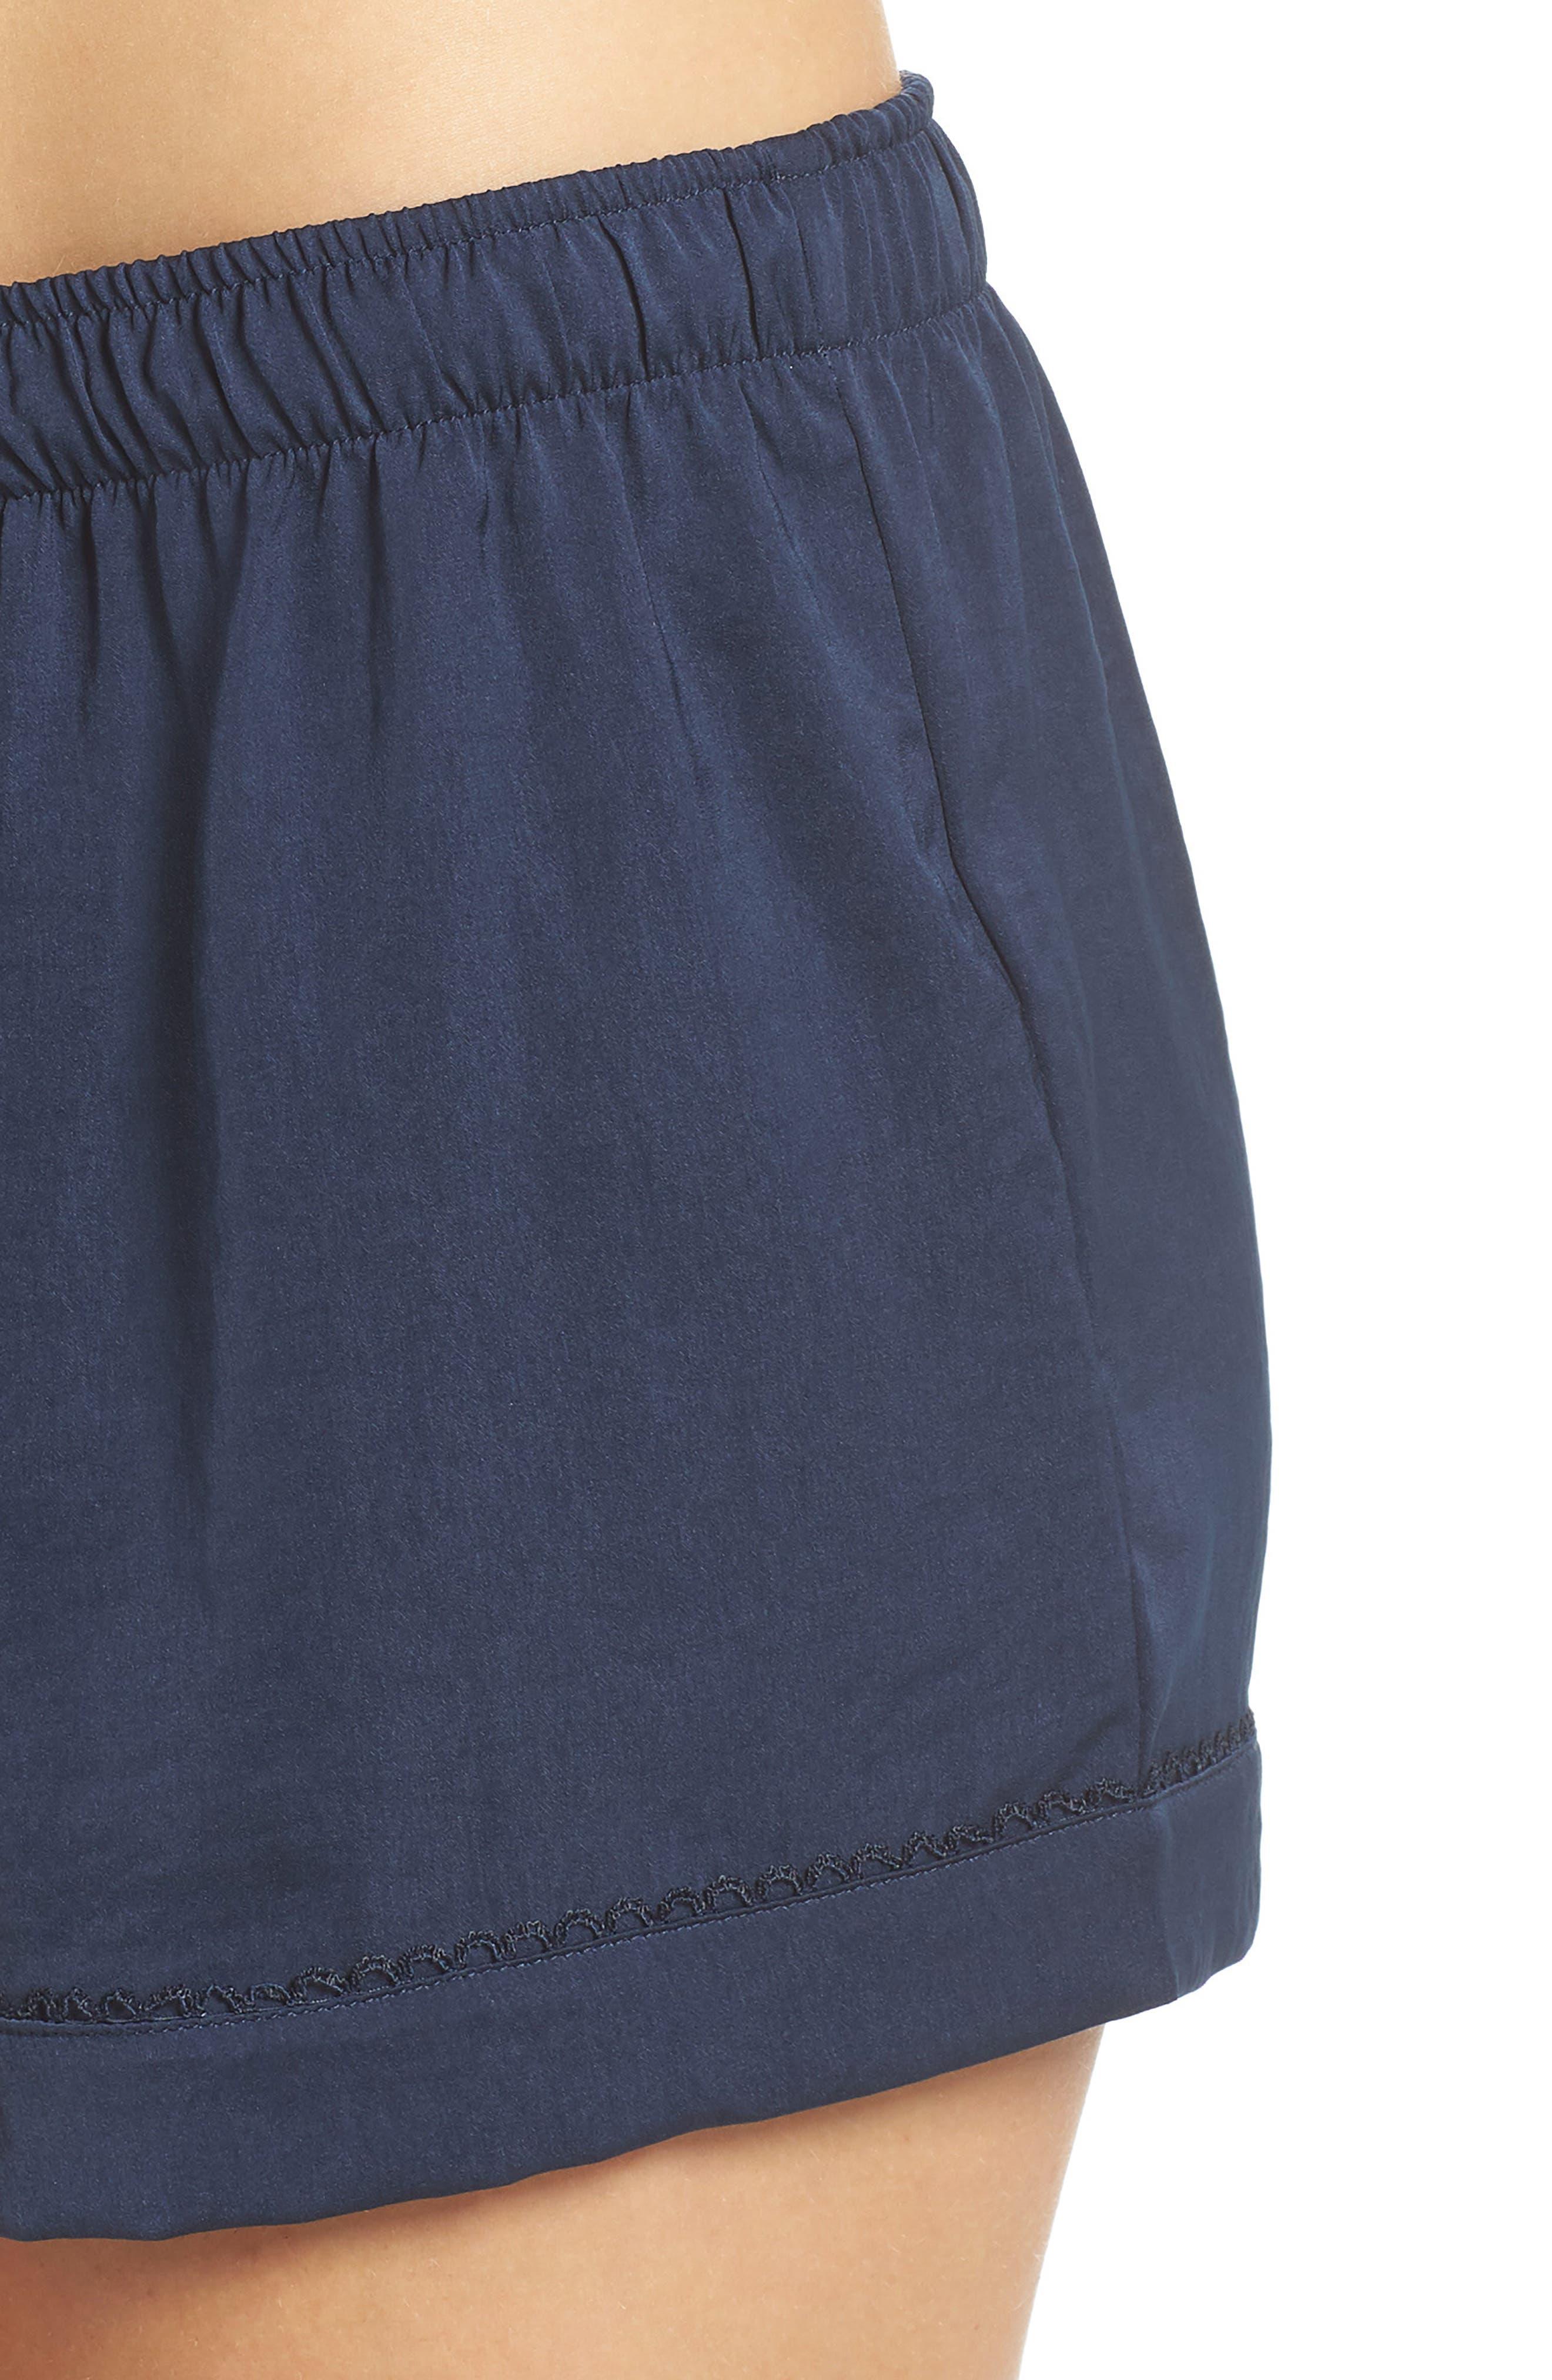 Pajama Shorts,                             Alternate thumbnail 4, color,                             400